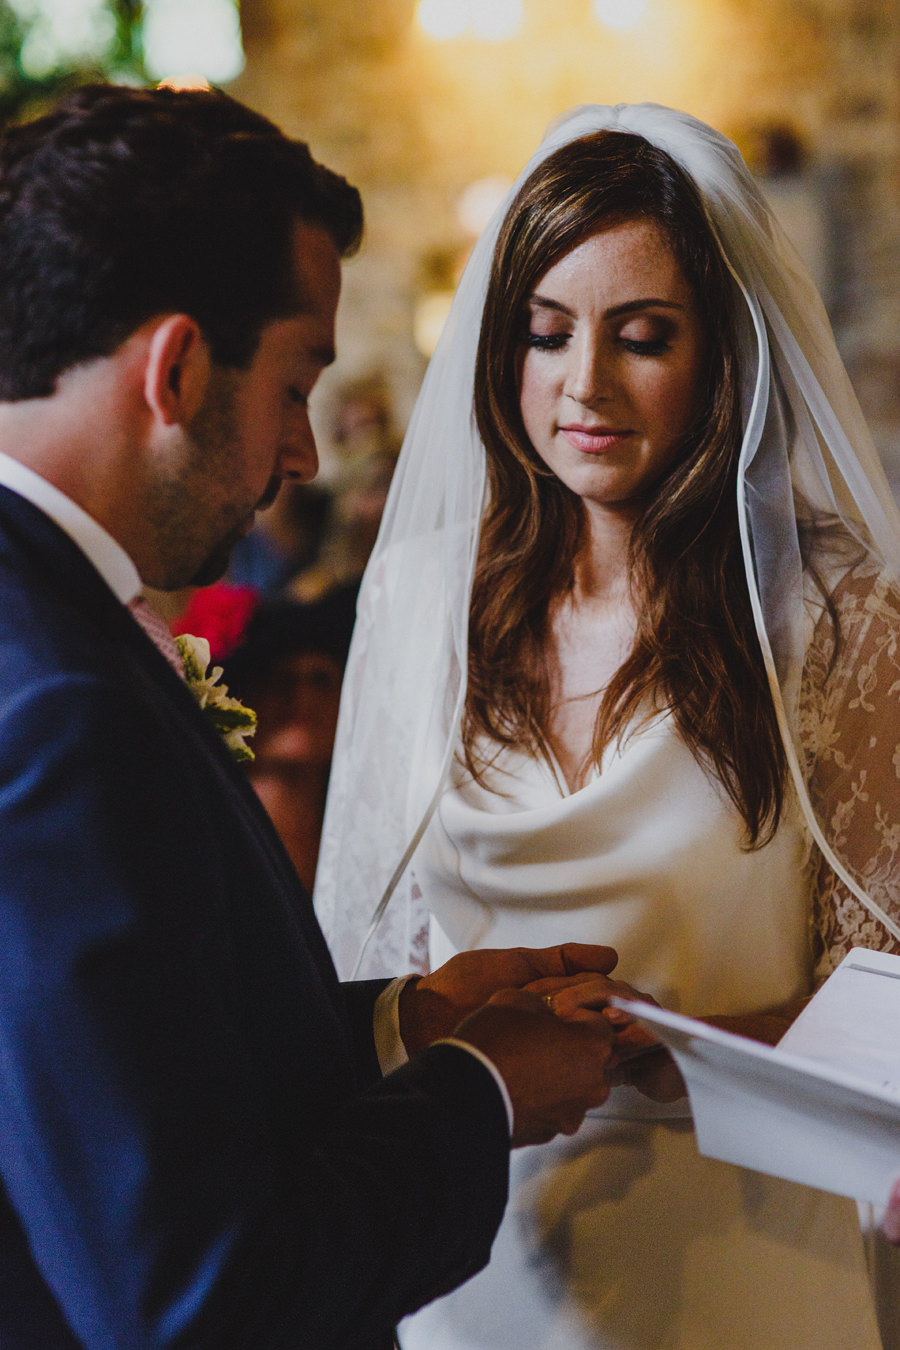 buckhurst-park-wedding-photography063